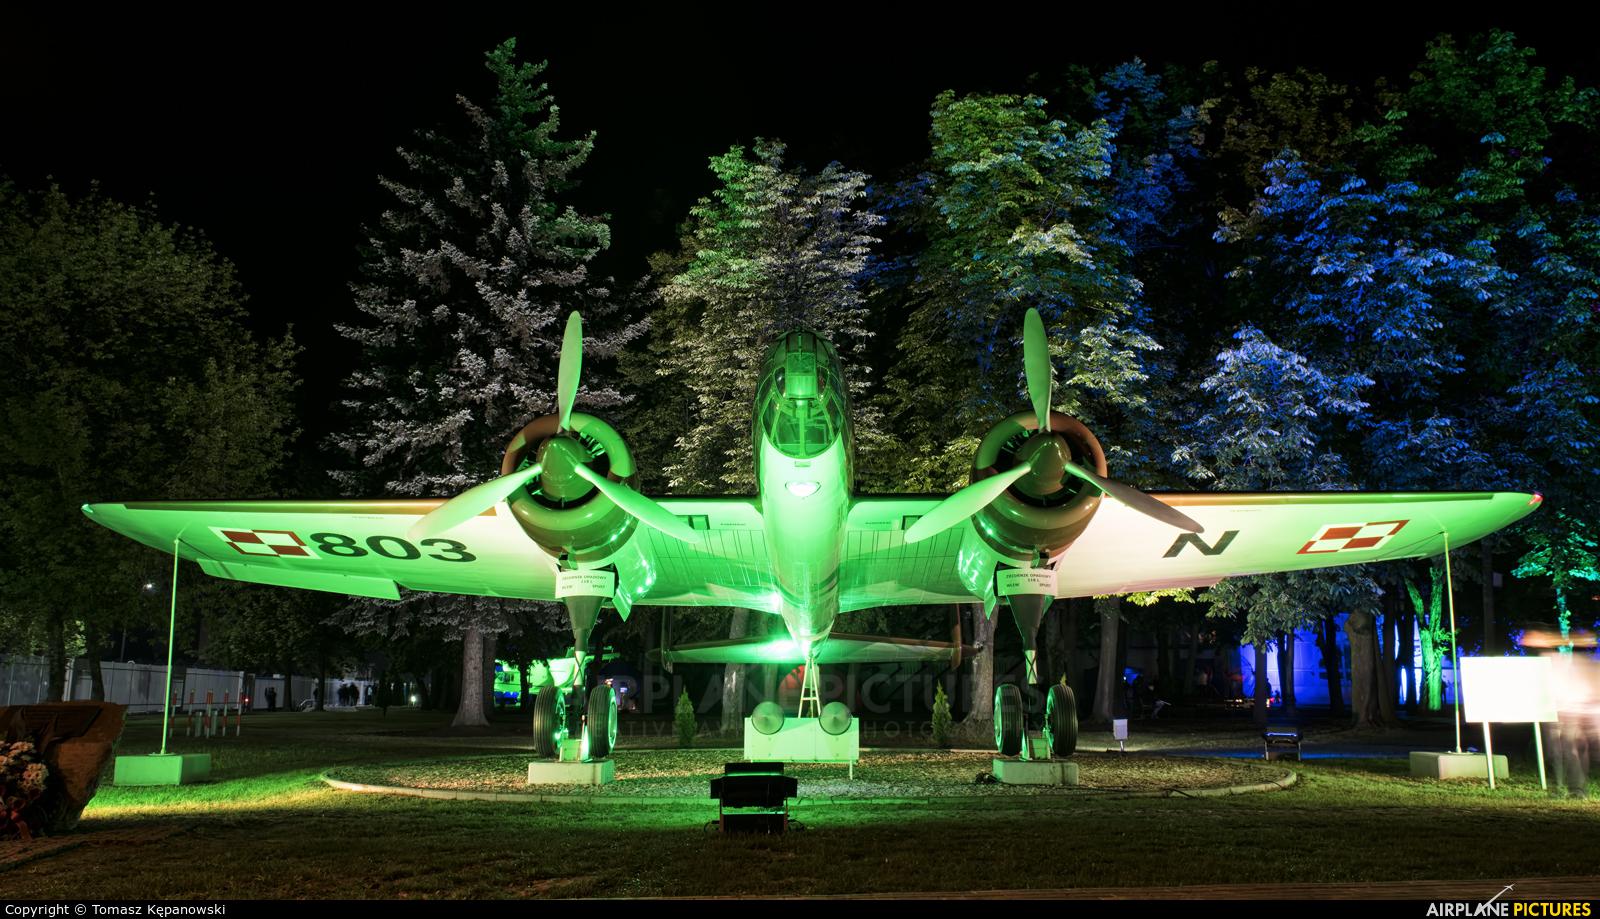 Poland - Air Force 803N aircraft at Off Airport - Poland